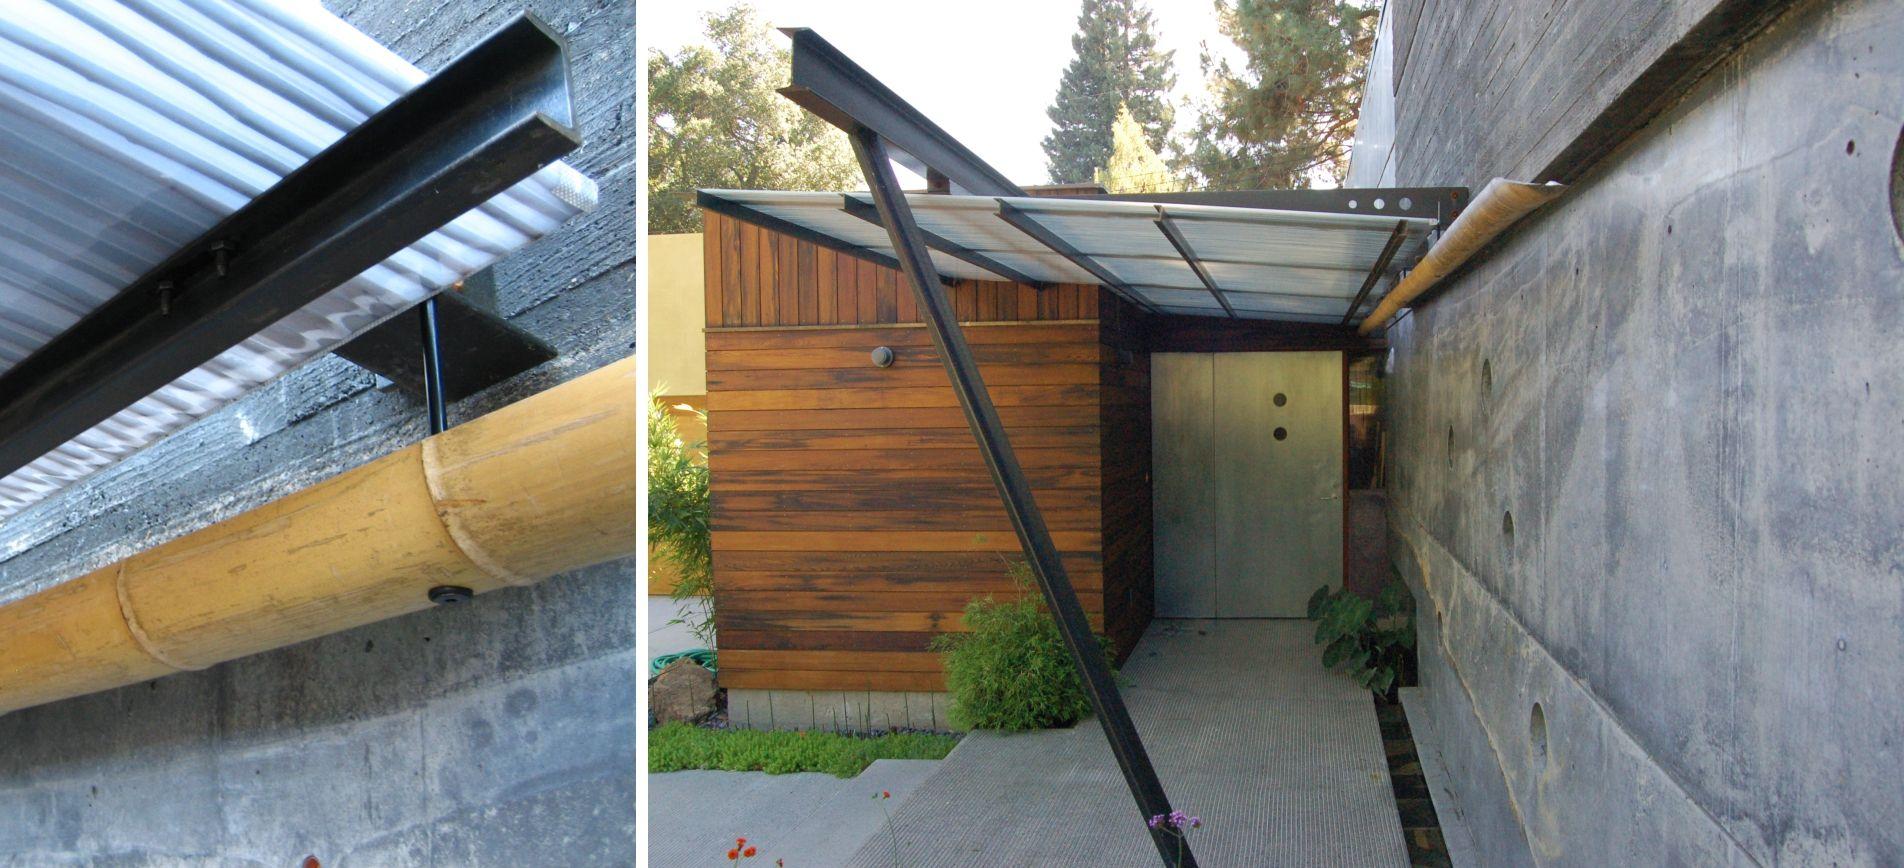 house 6 by cheng design  concrete house  modern  entryway  pivot door  bamboo gutter  fu